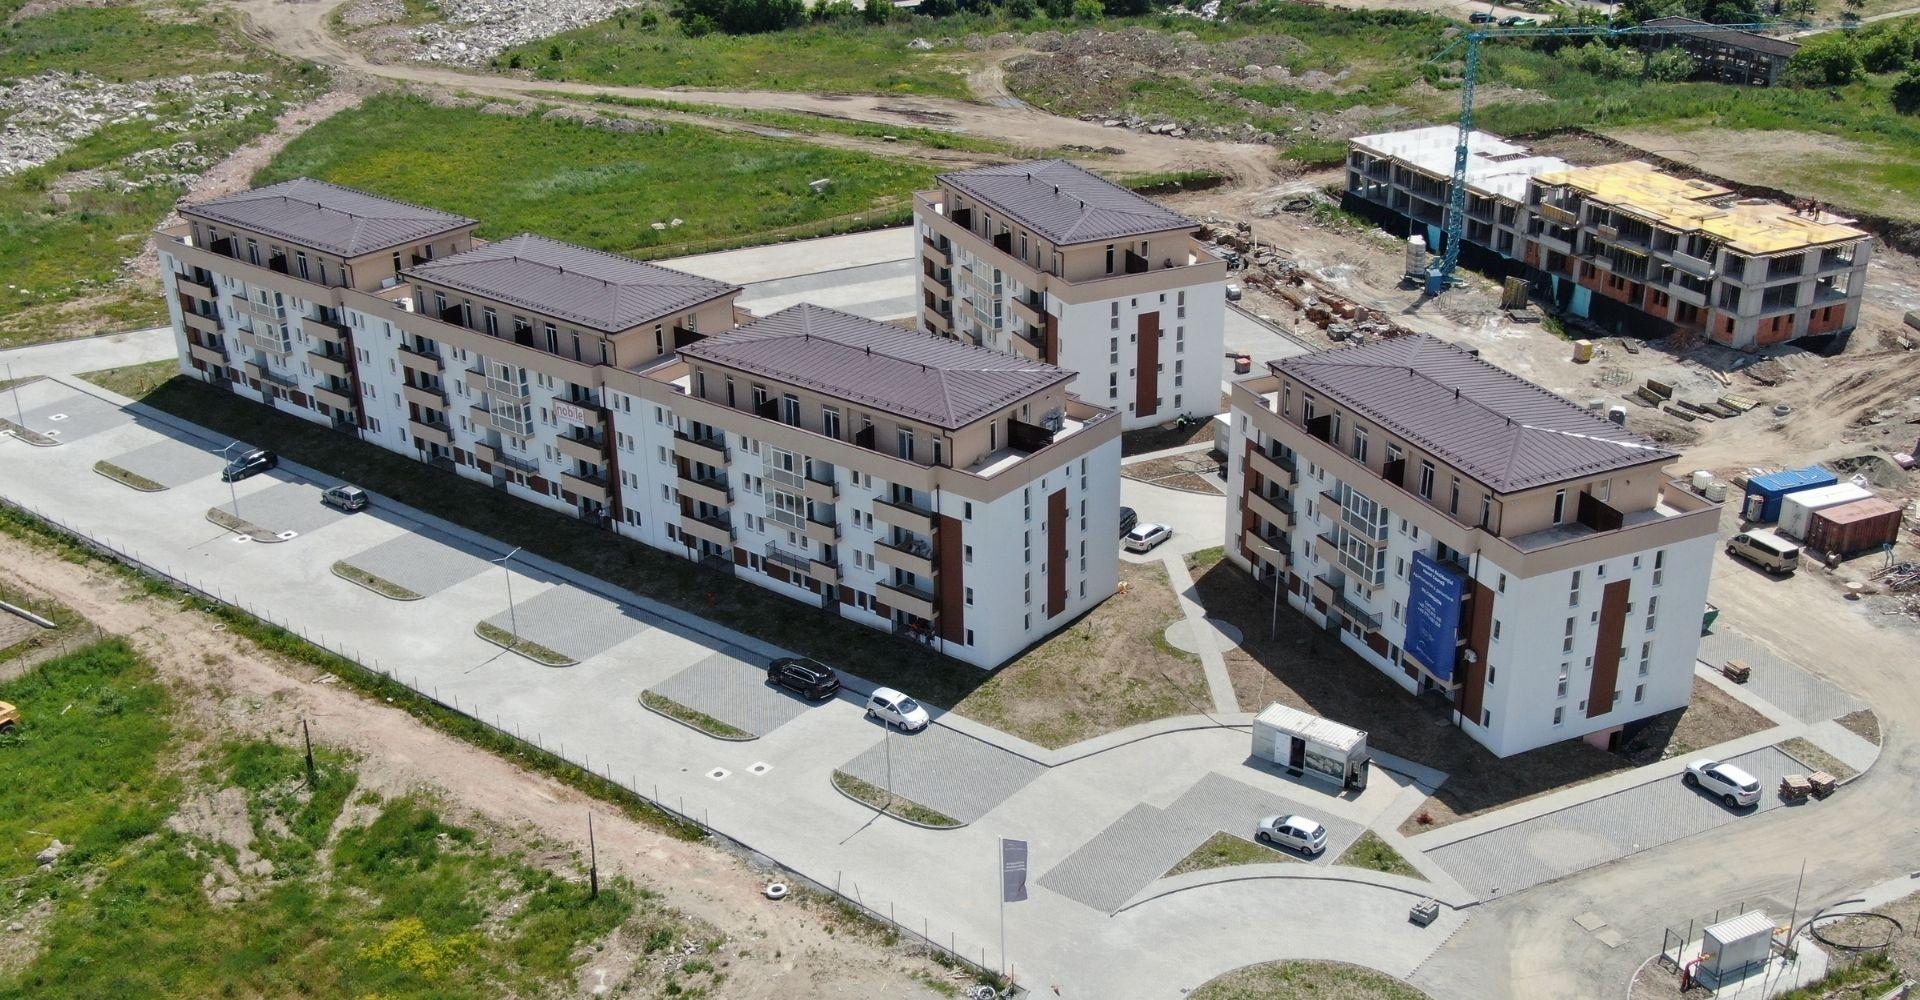 Henri Coanda, Sibiu (480 Wohnungen)